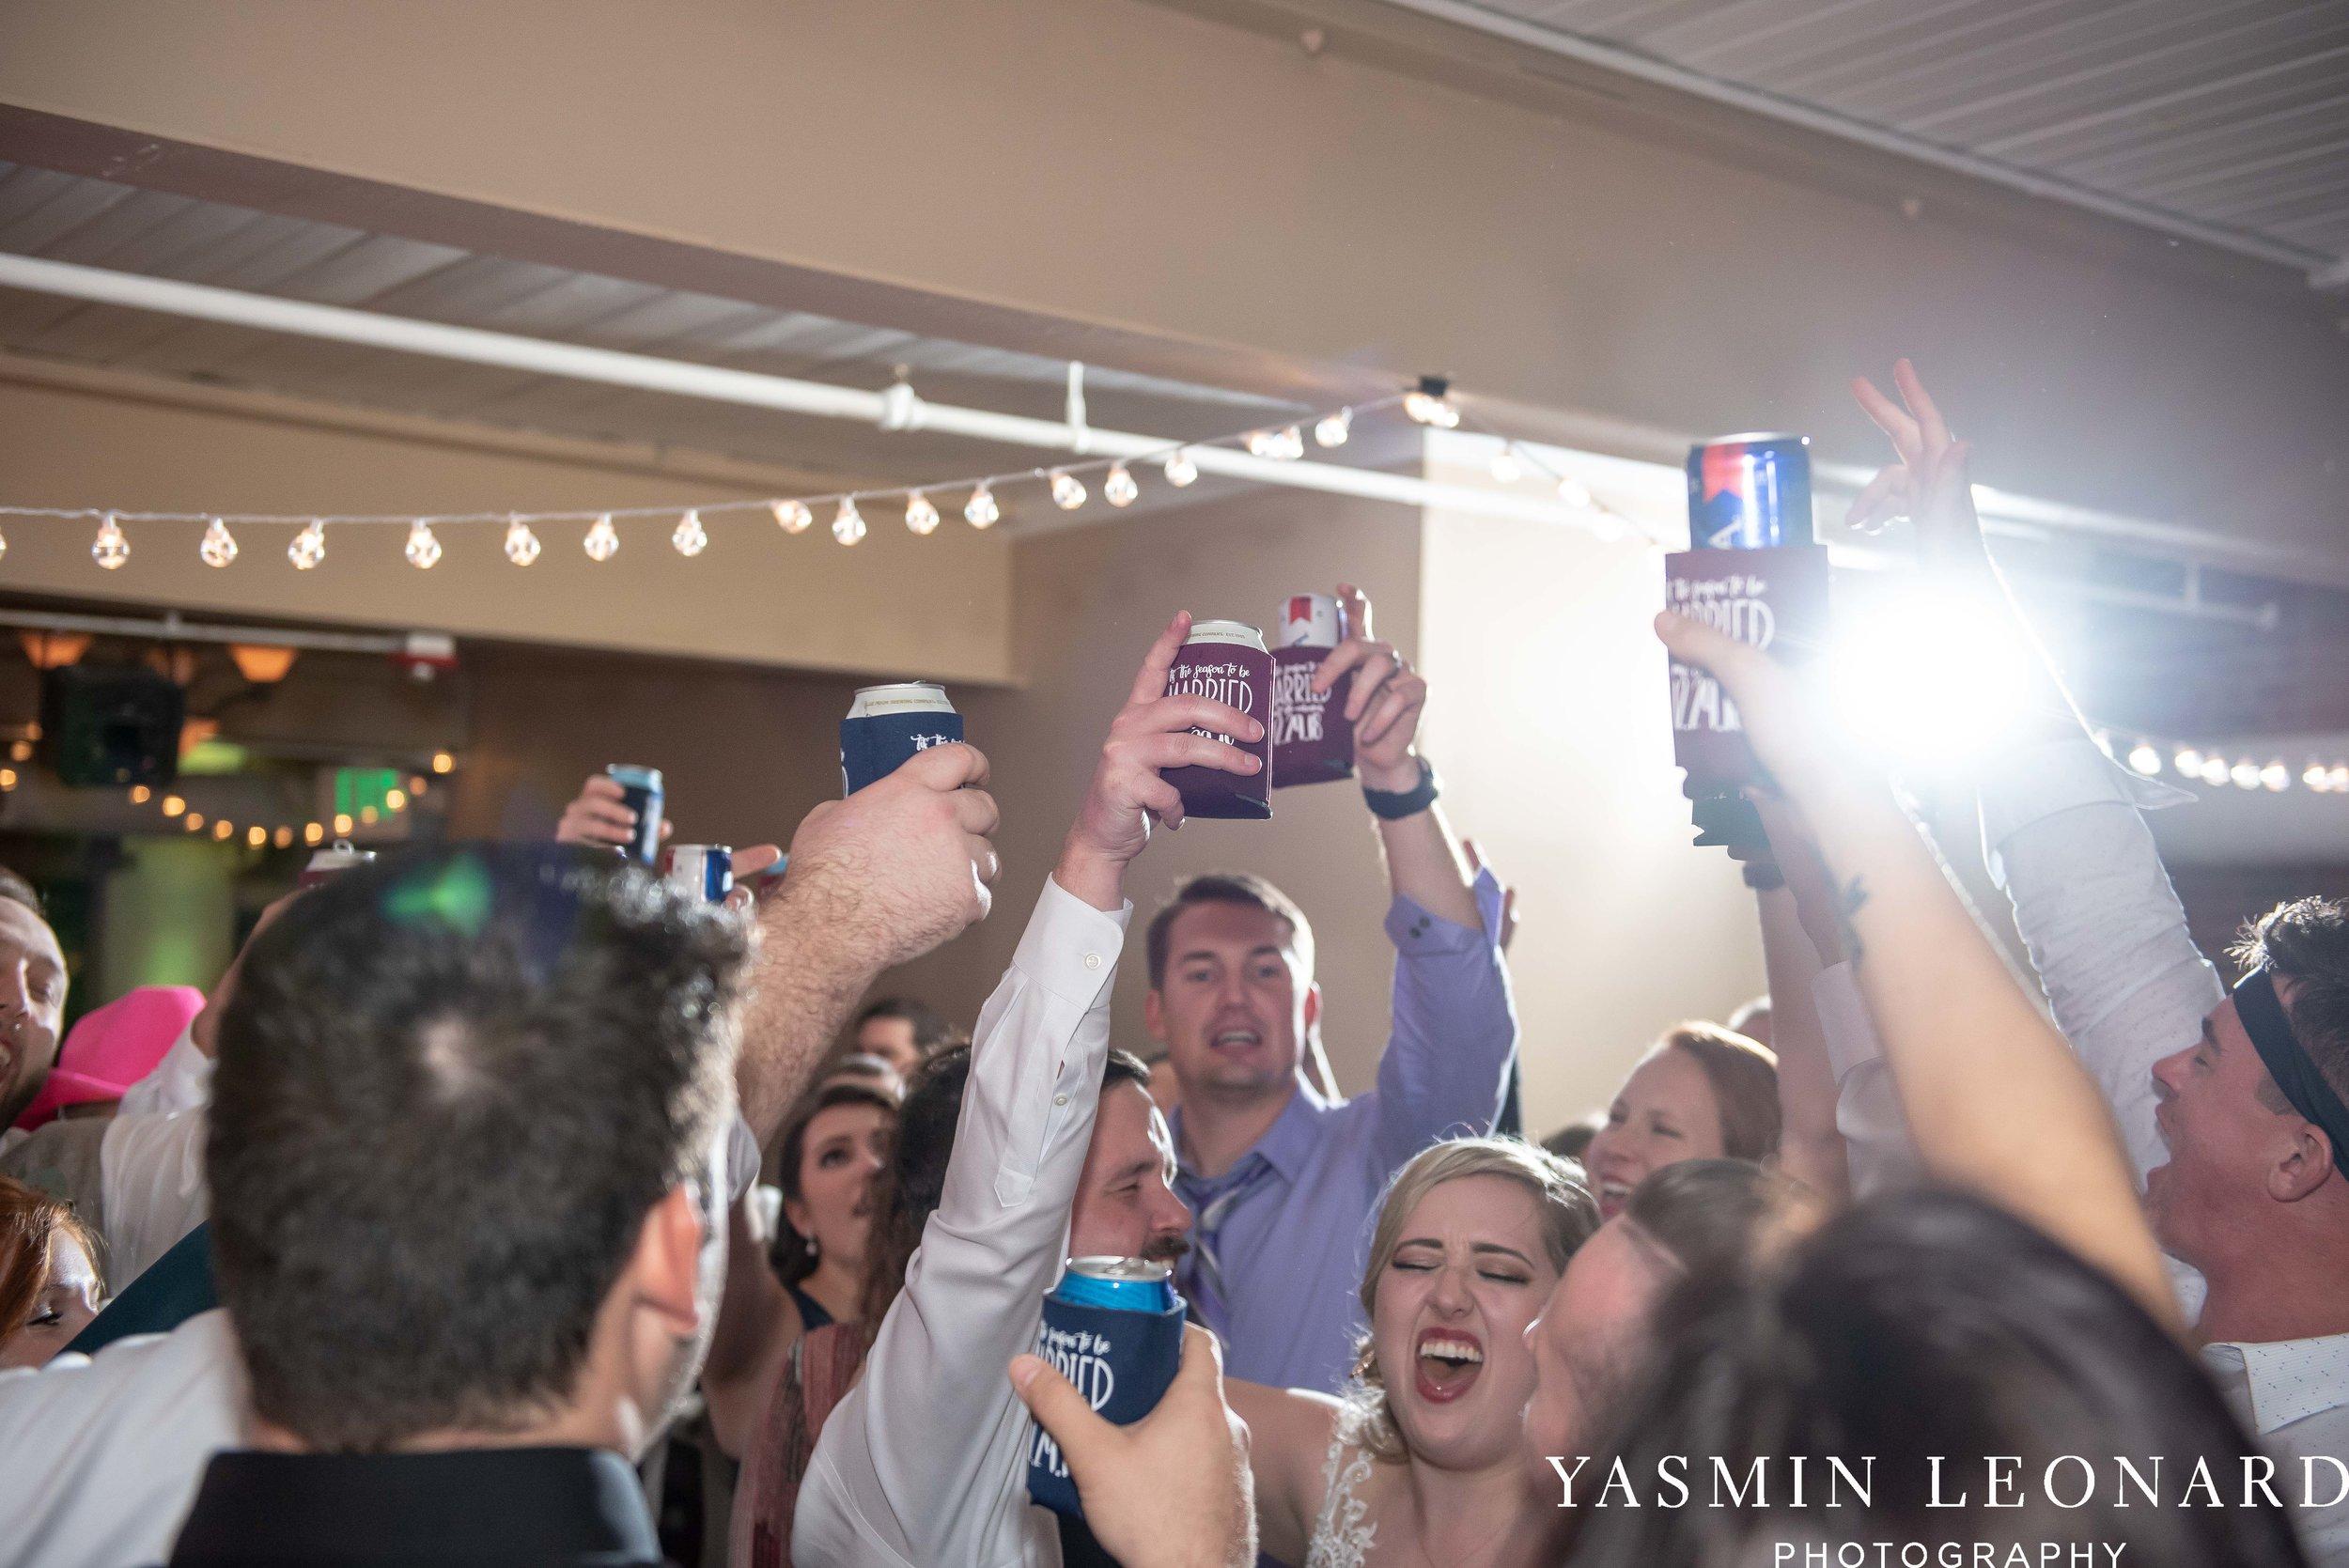 Rebekah and Matt - 105 Worth Event Centre - Yasmin Leonard Photography - Asheboro Wedding - NC Wedding - High Point Weddings - Triad Weddings - Winter Wedding-77.jpg